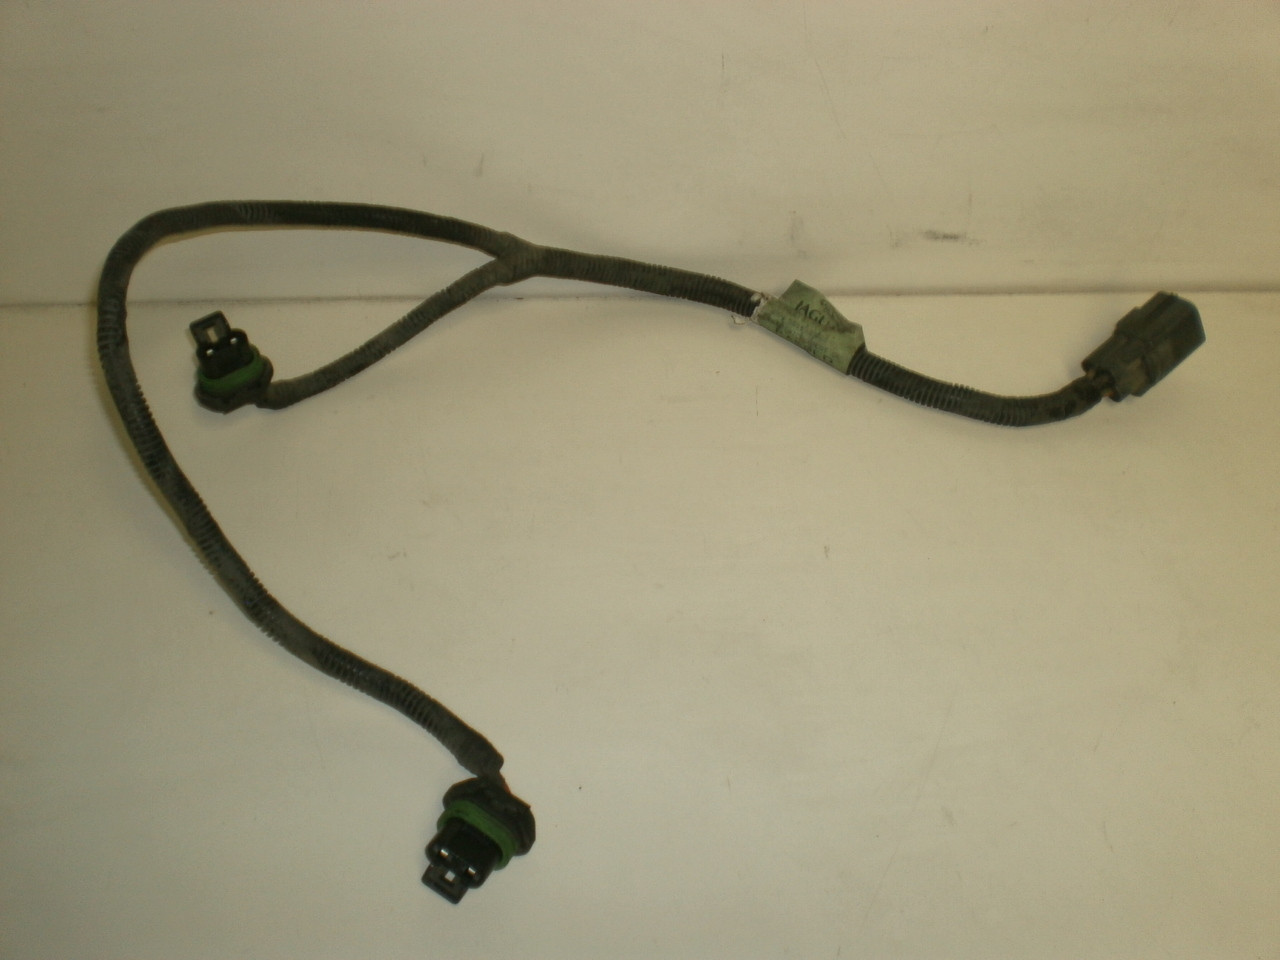 medium resolution of 1998 2002 jaguar xj8 vanden plas front seat tan head rest support fan wire harness